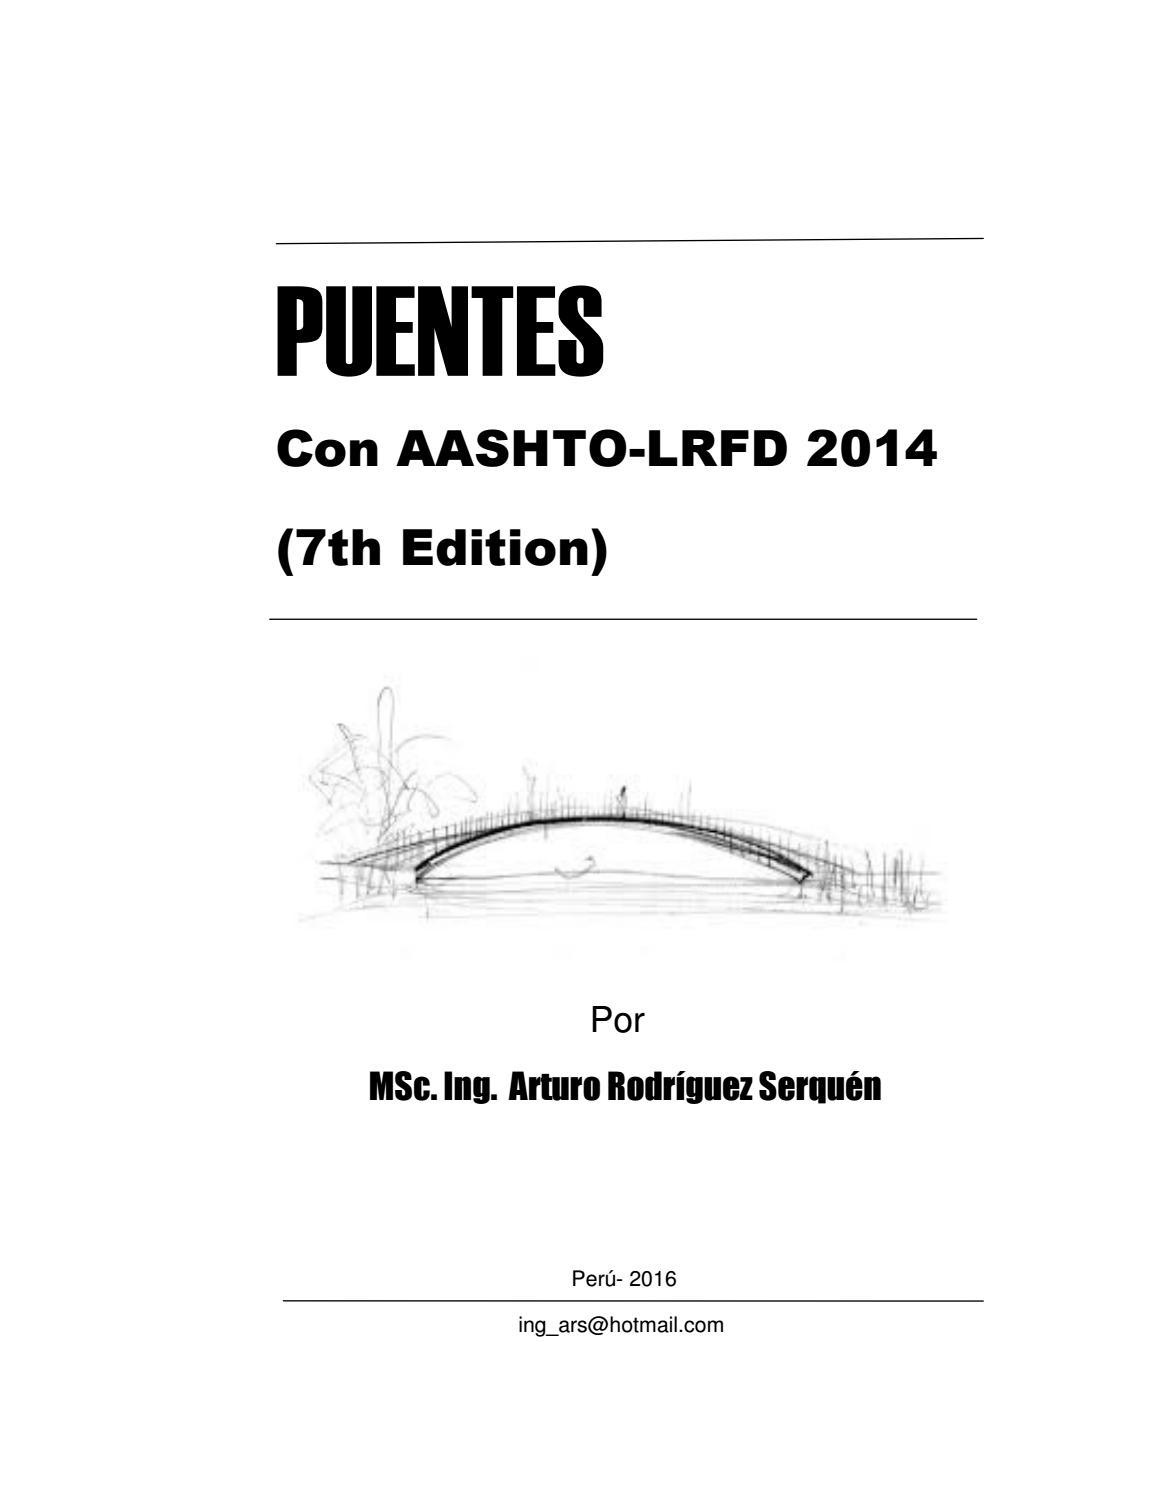 PUENTES Con AASHTO-LRFD 2014 ing arturo rodríguez serquén